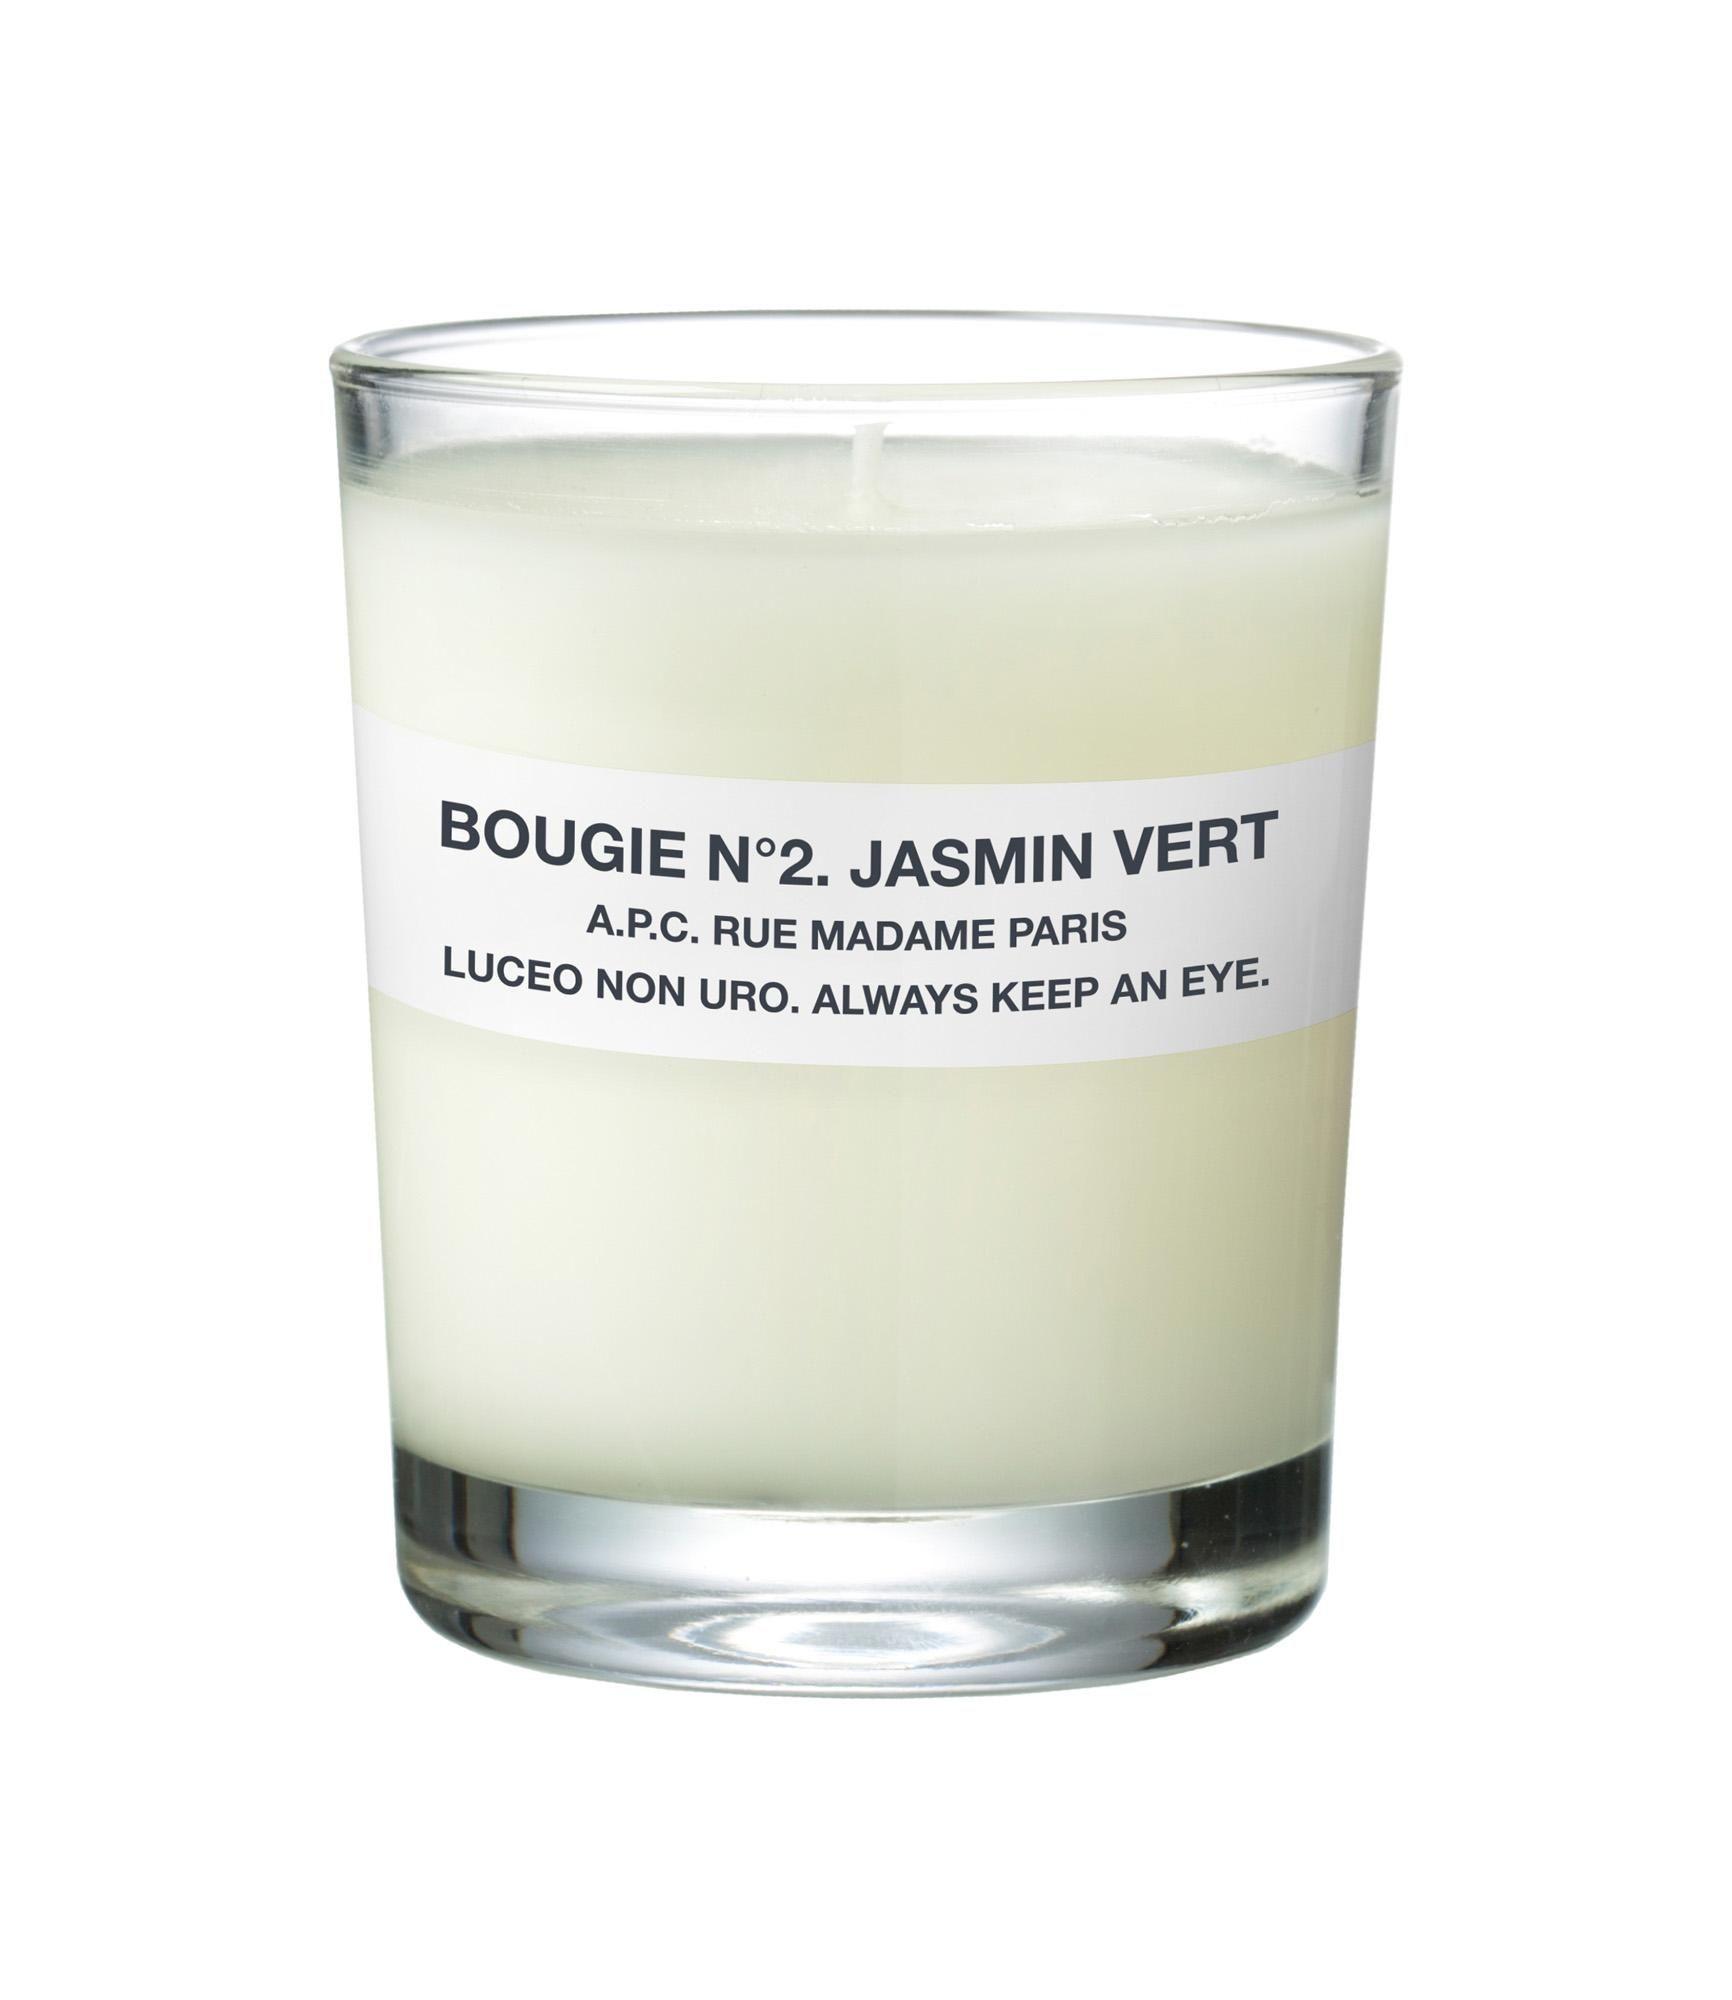 bougie parfum e a p c jasmin vert a p c objets